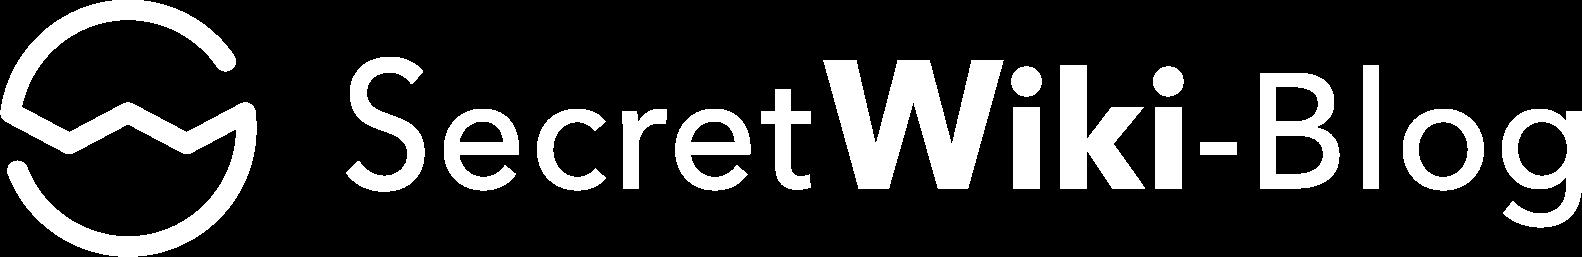 Secret Wiki-Blog